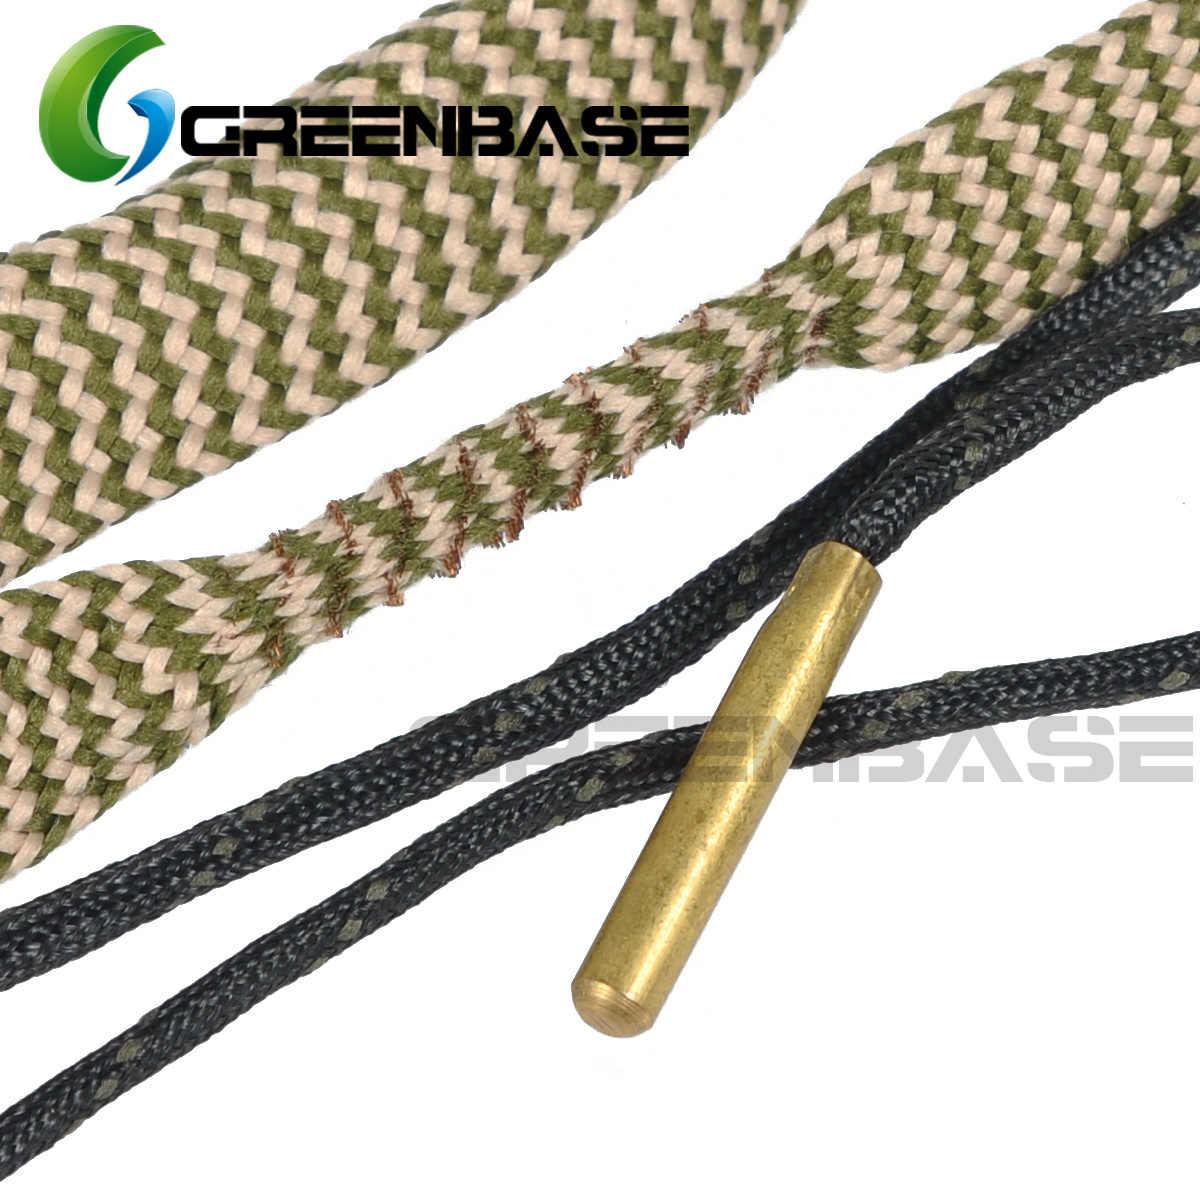 Jacht Geweer Bore Cleaner Snake.22 Cal.223 Cal.38 Cal & 5.56mm, 7.62mm, 12GA Rifle Cleaning Kit Tool Geweerloop Calibre Slang Touw